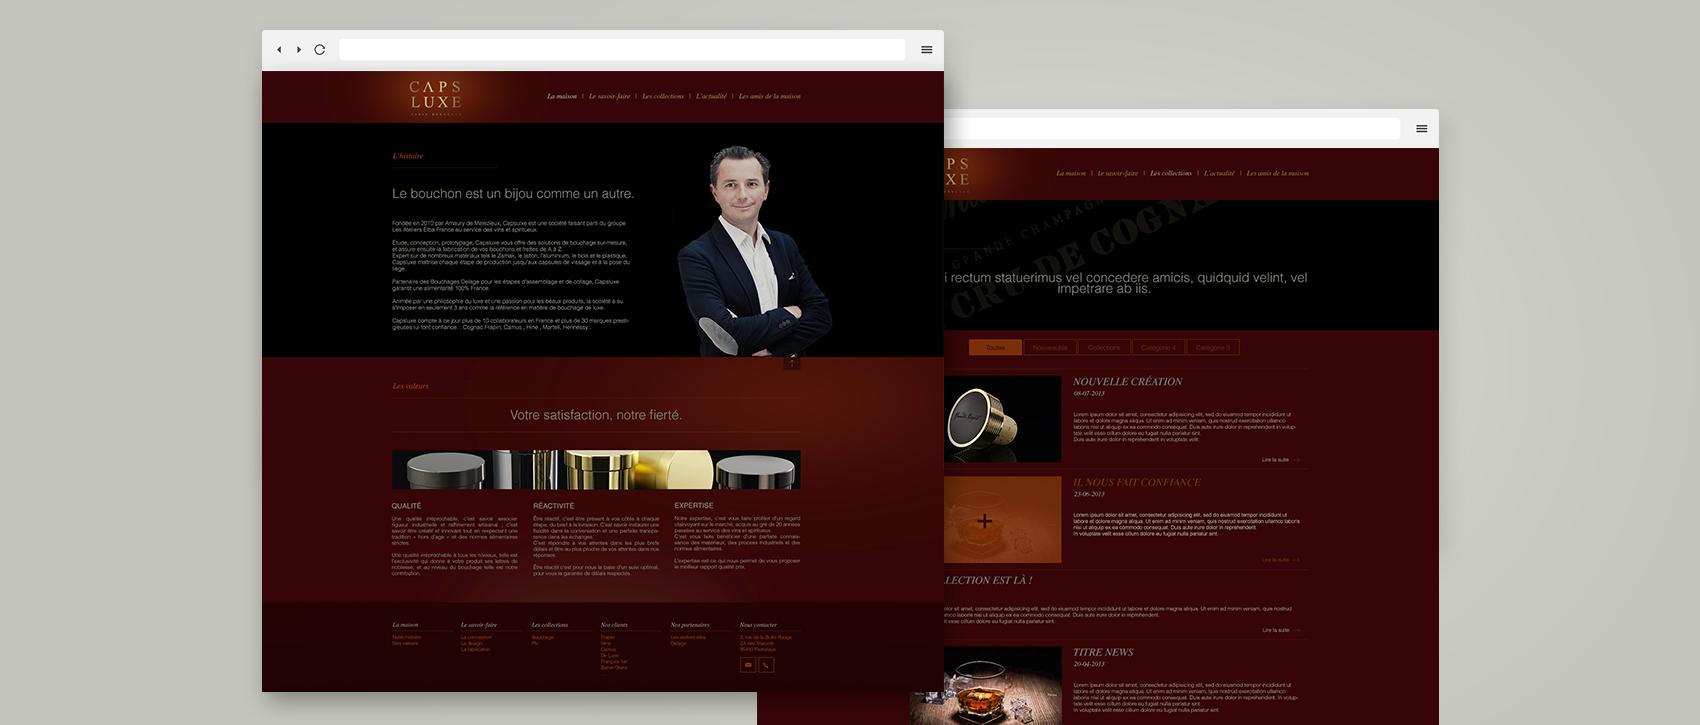 CAPSLUXE SITE WEB